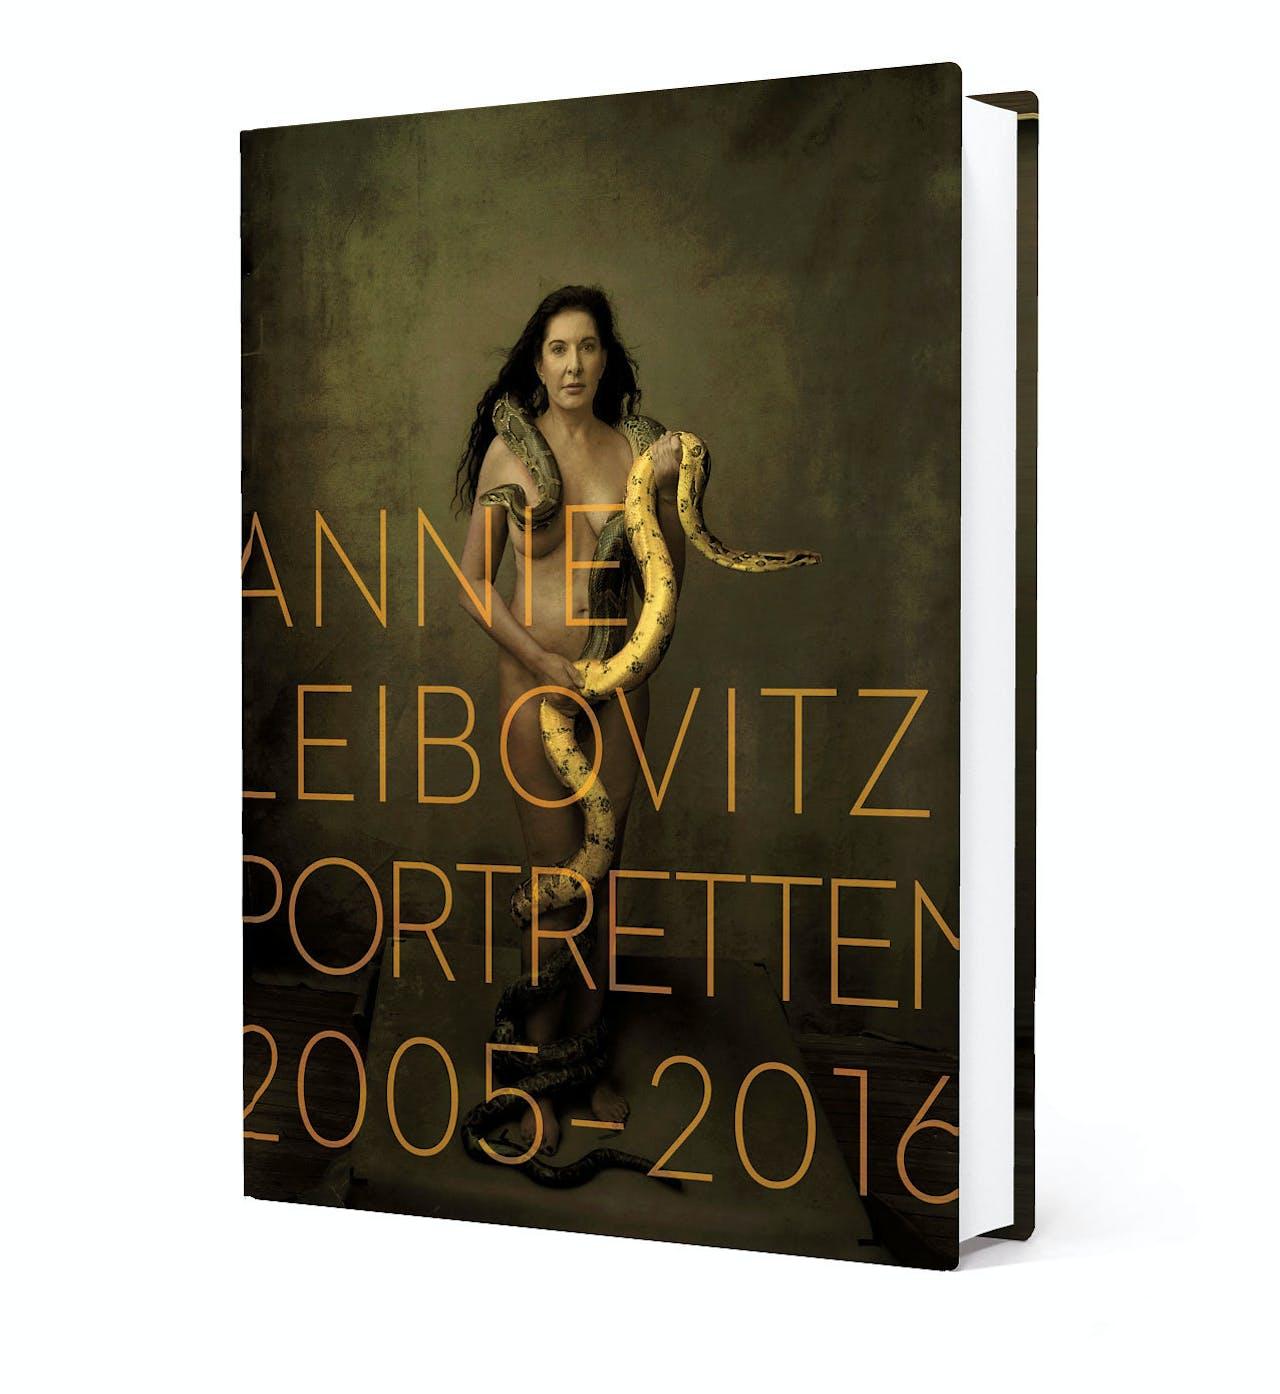 Annie Leibovitz: portretten 2005-2016, uitgeverij Lannoo, €79.